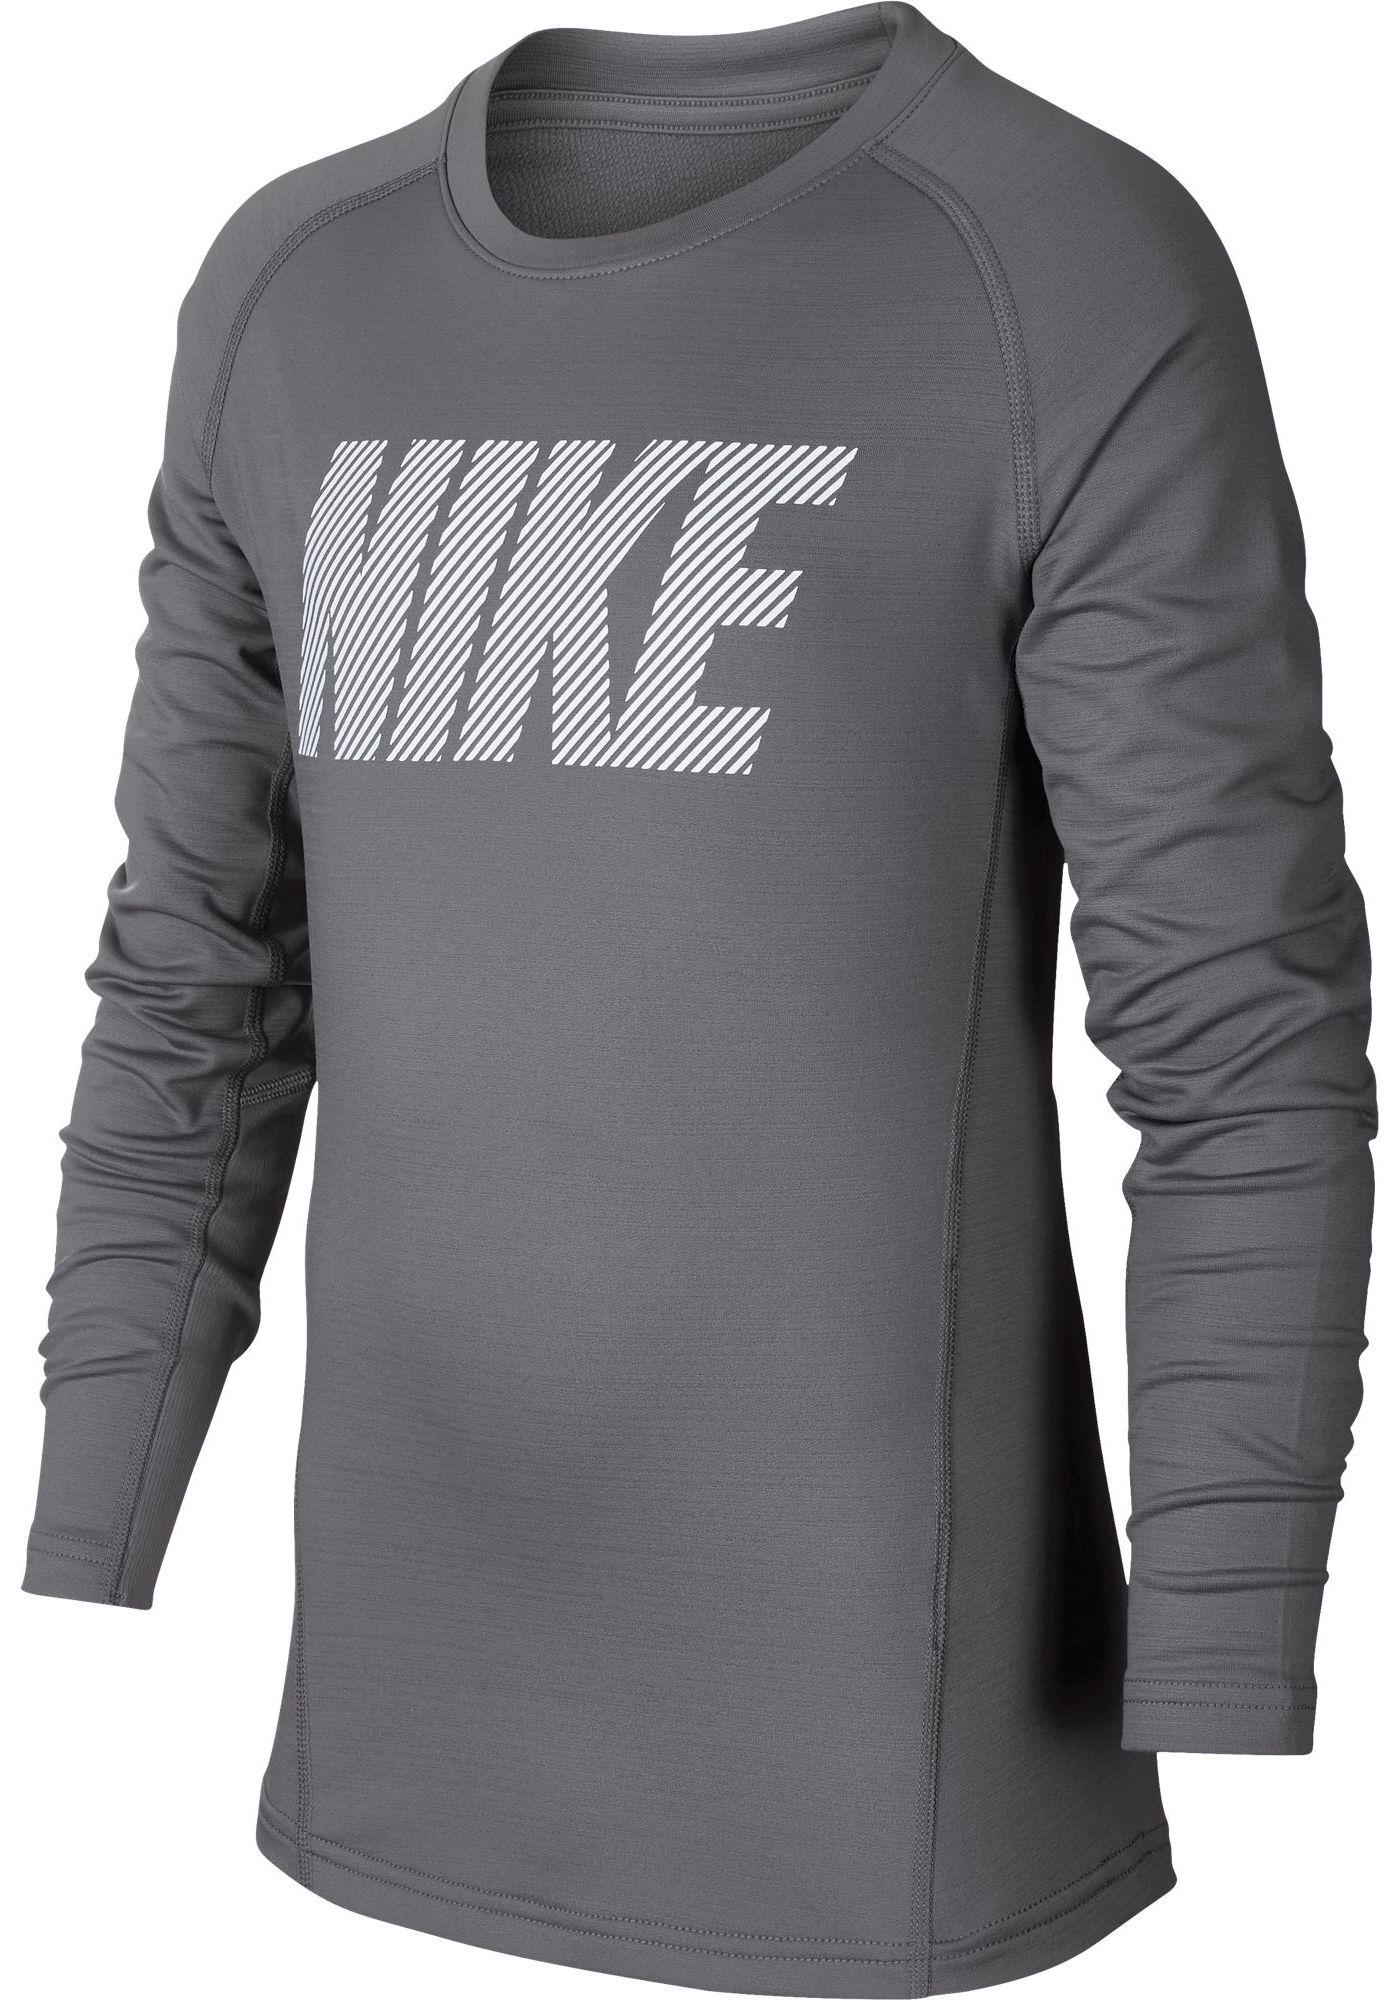 Nike Pro Boy's Therma Long Sleeve Shirt